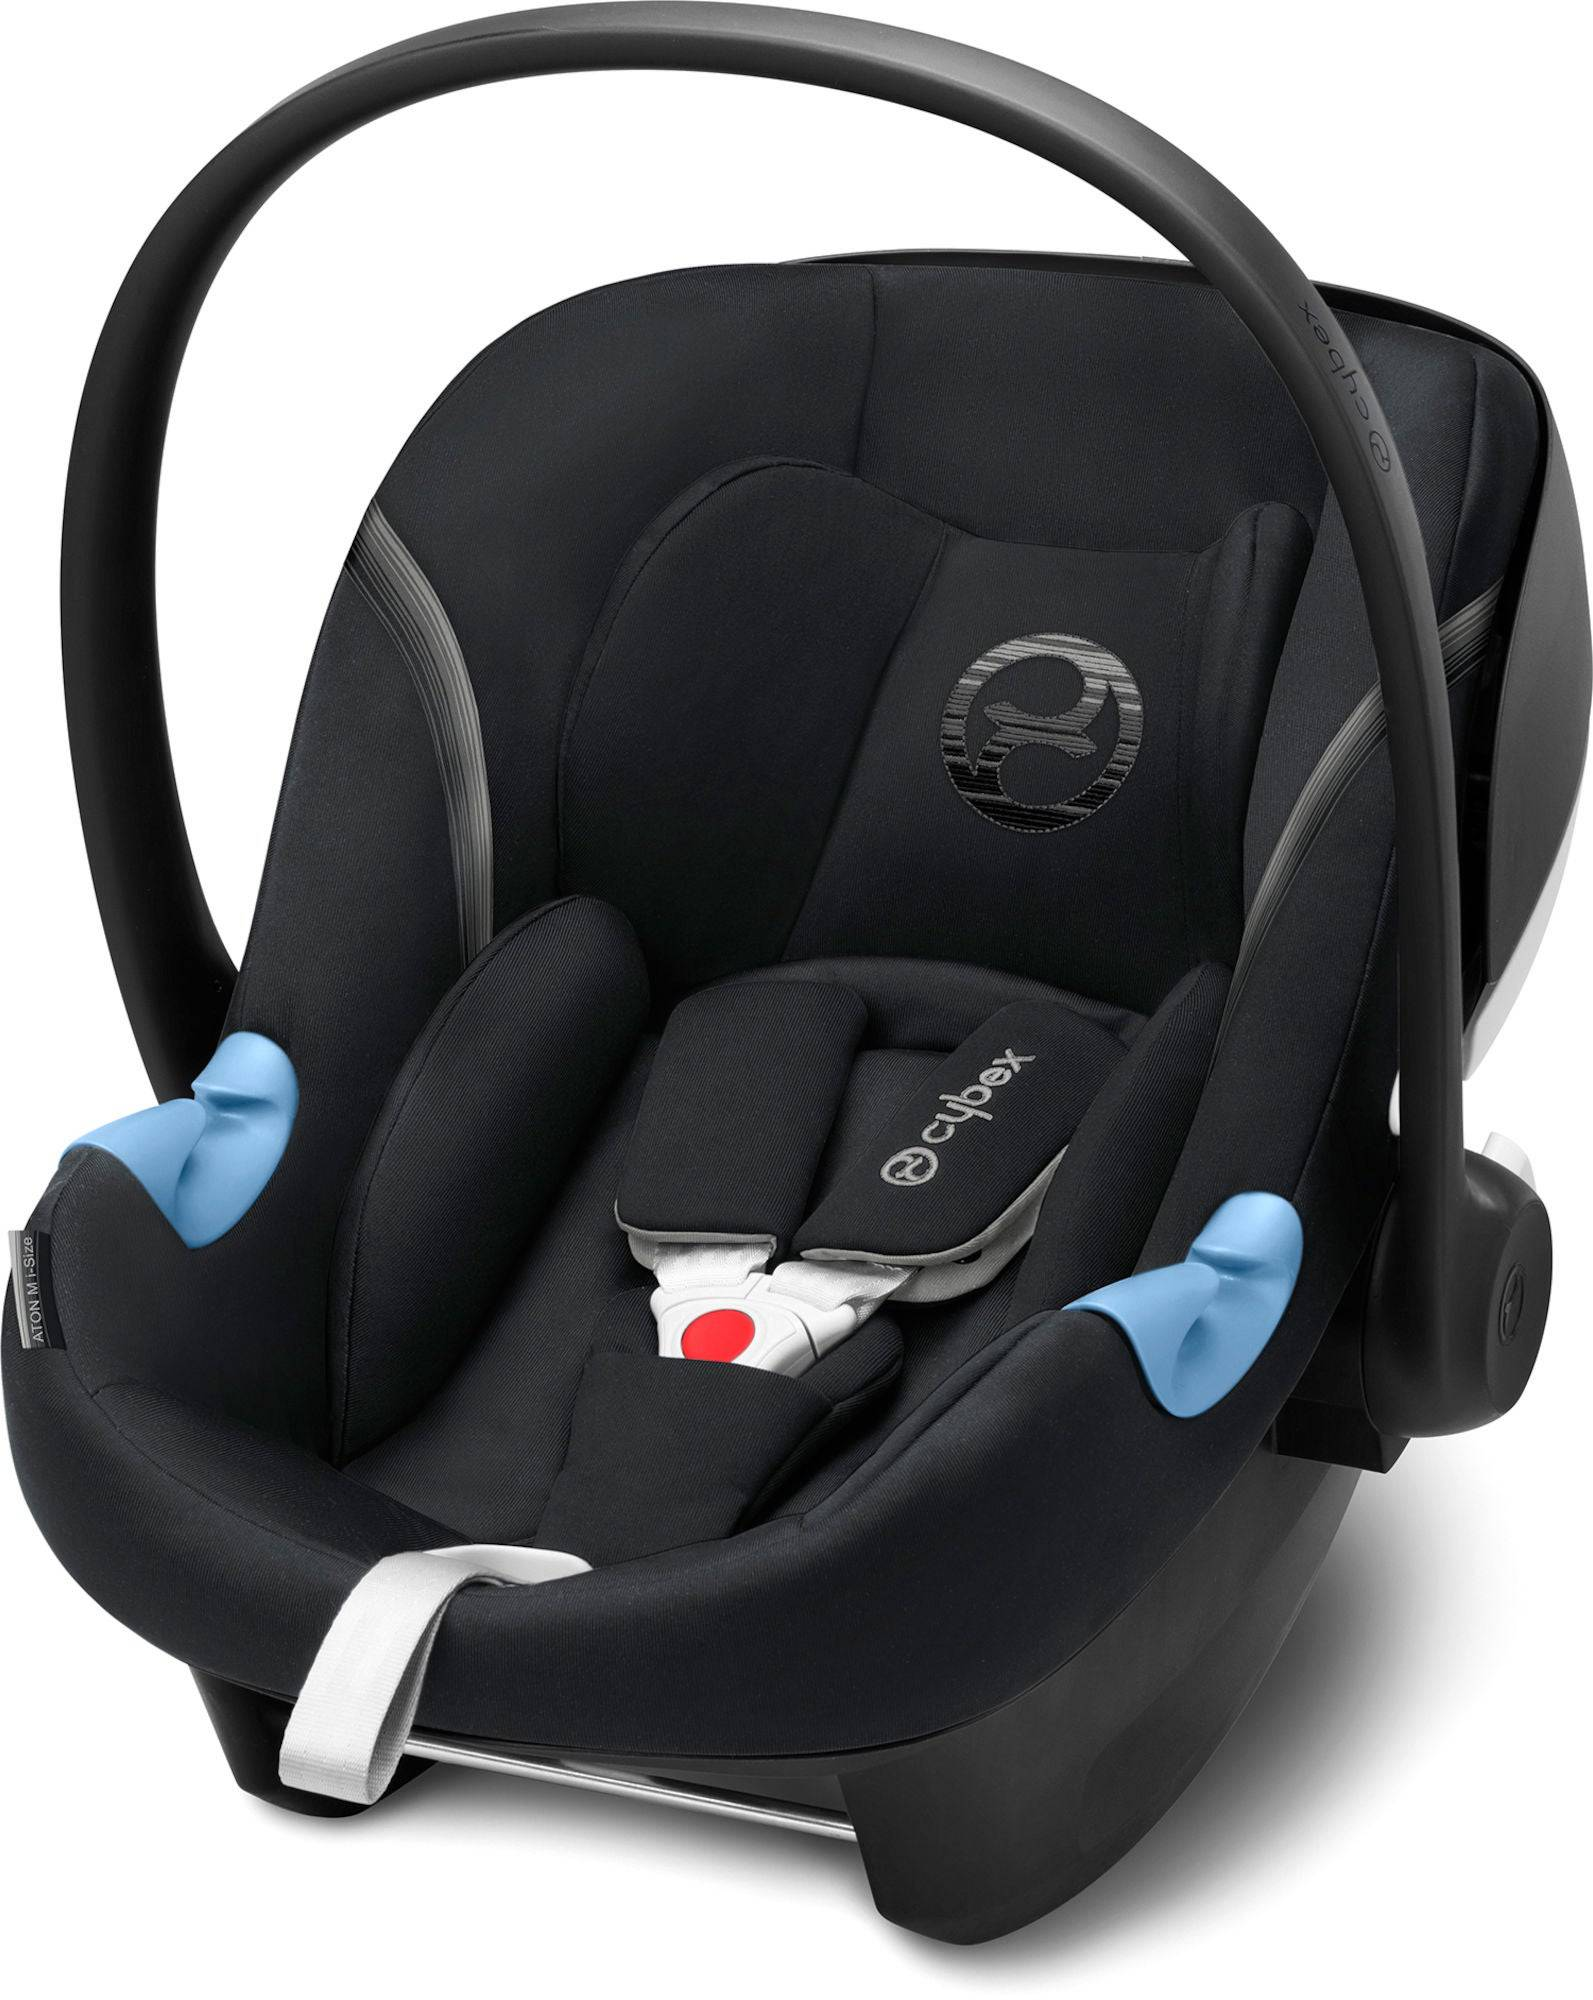 Cybex Aton M i-Size Babyskydd, Lavastone Black